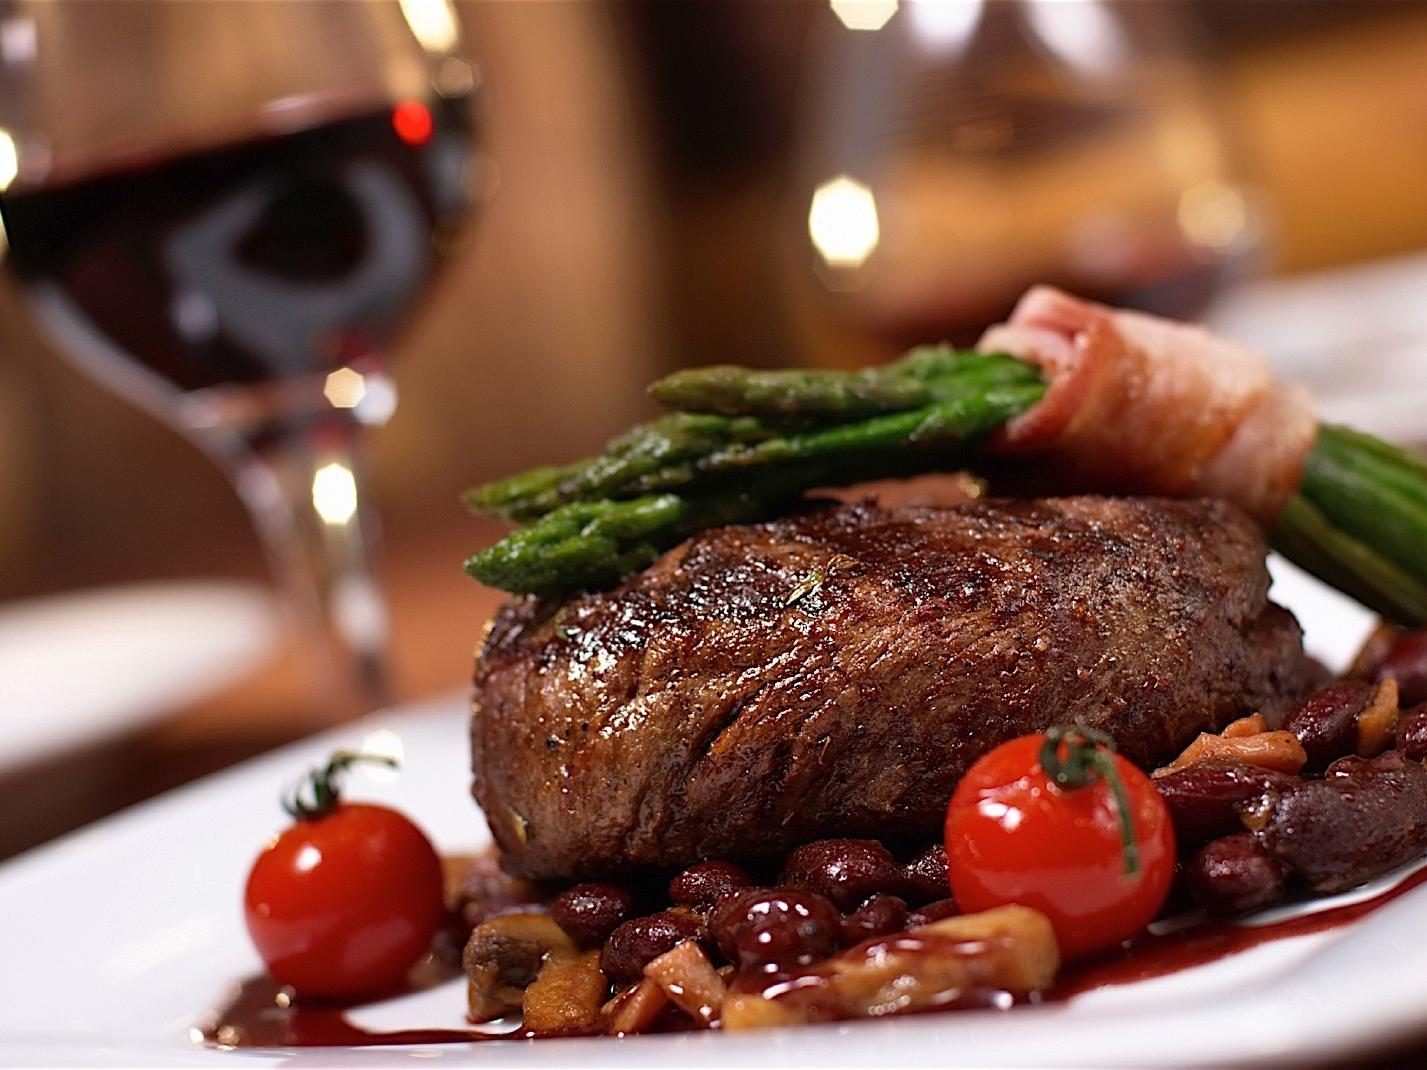 steak, mushrooms and red wine